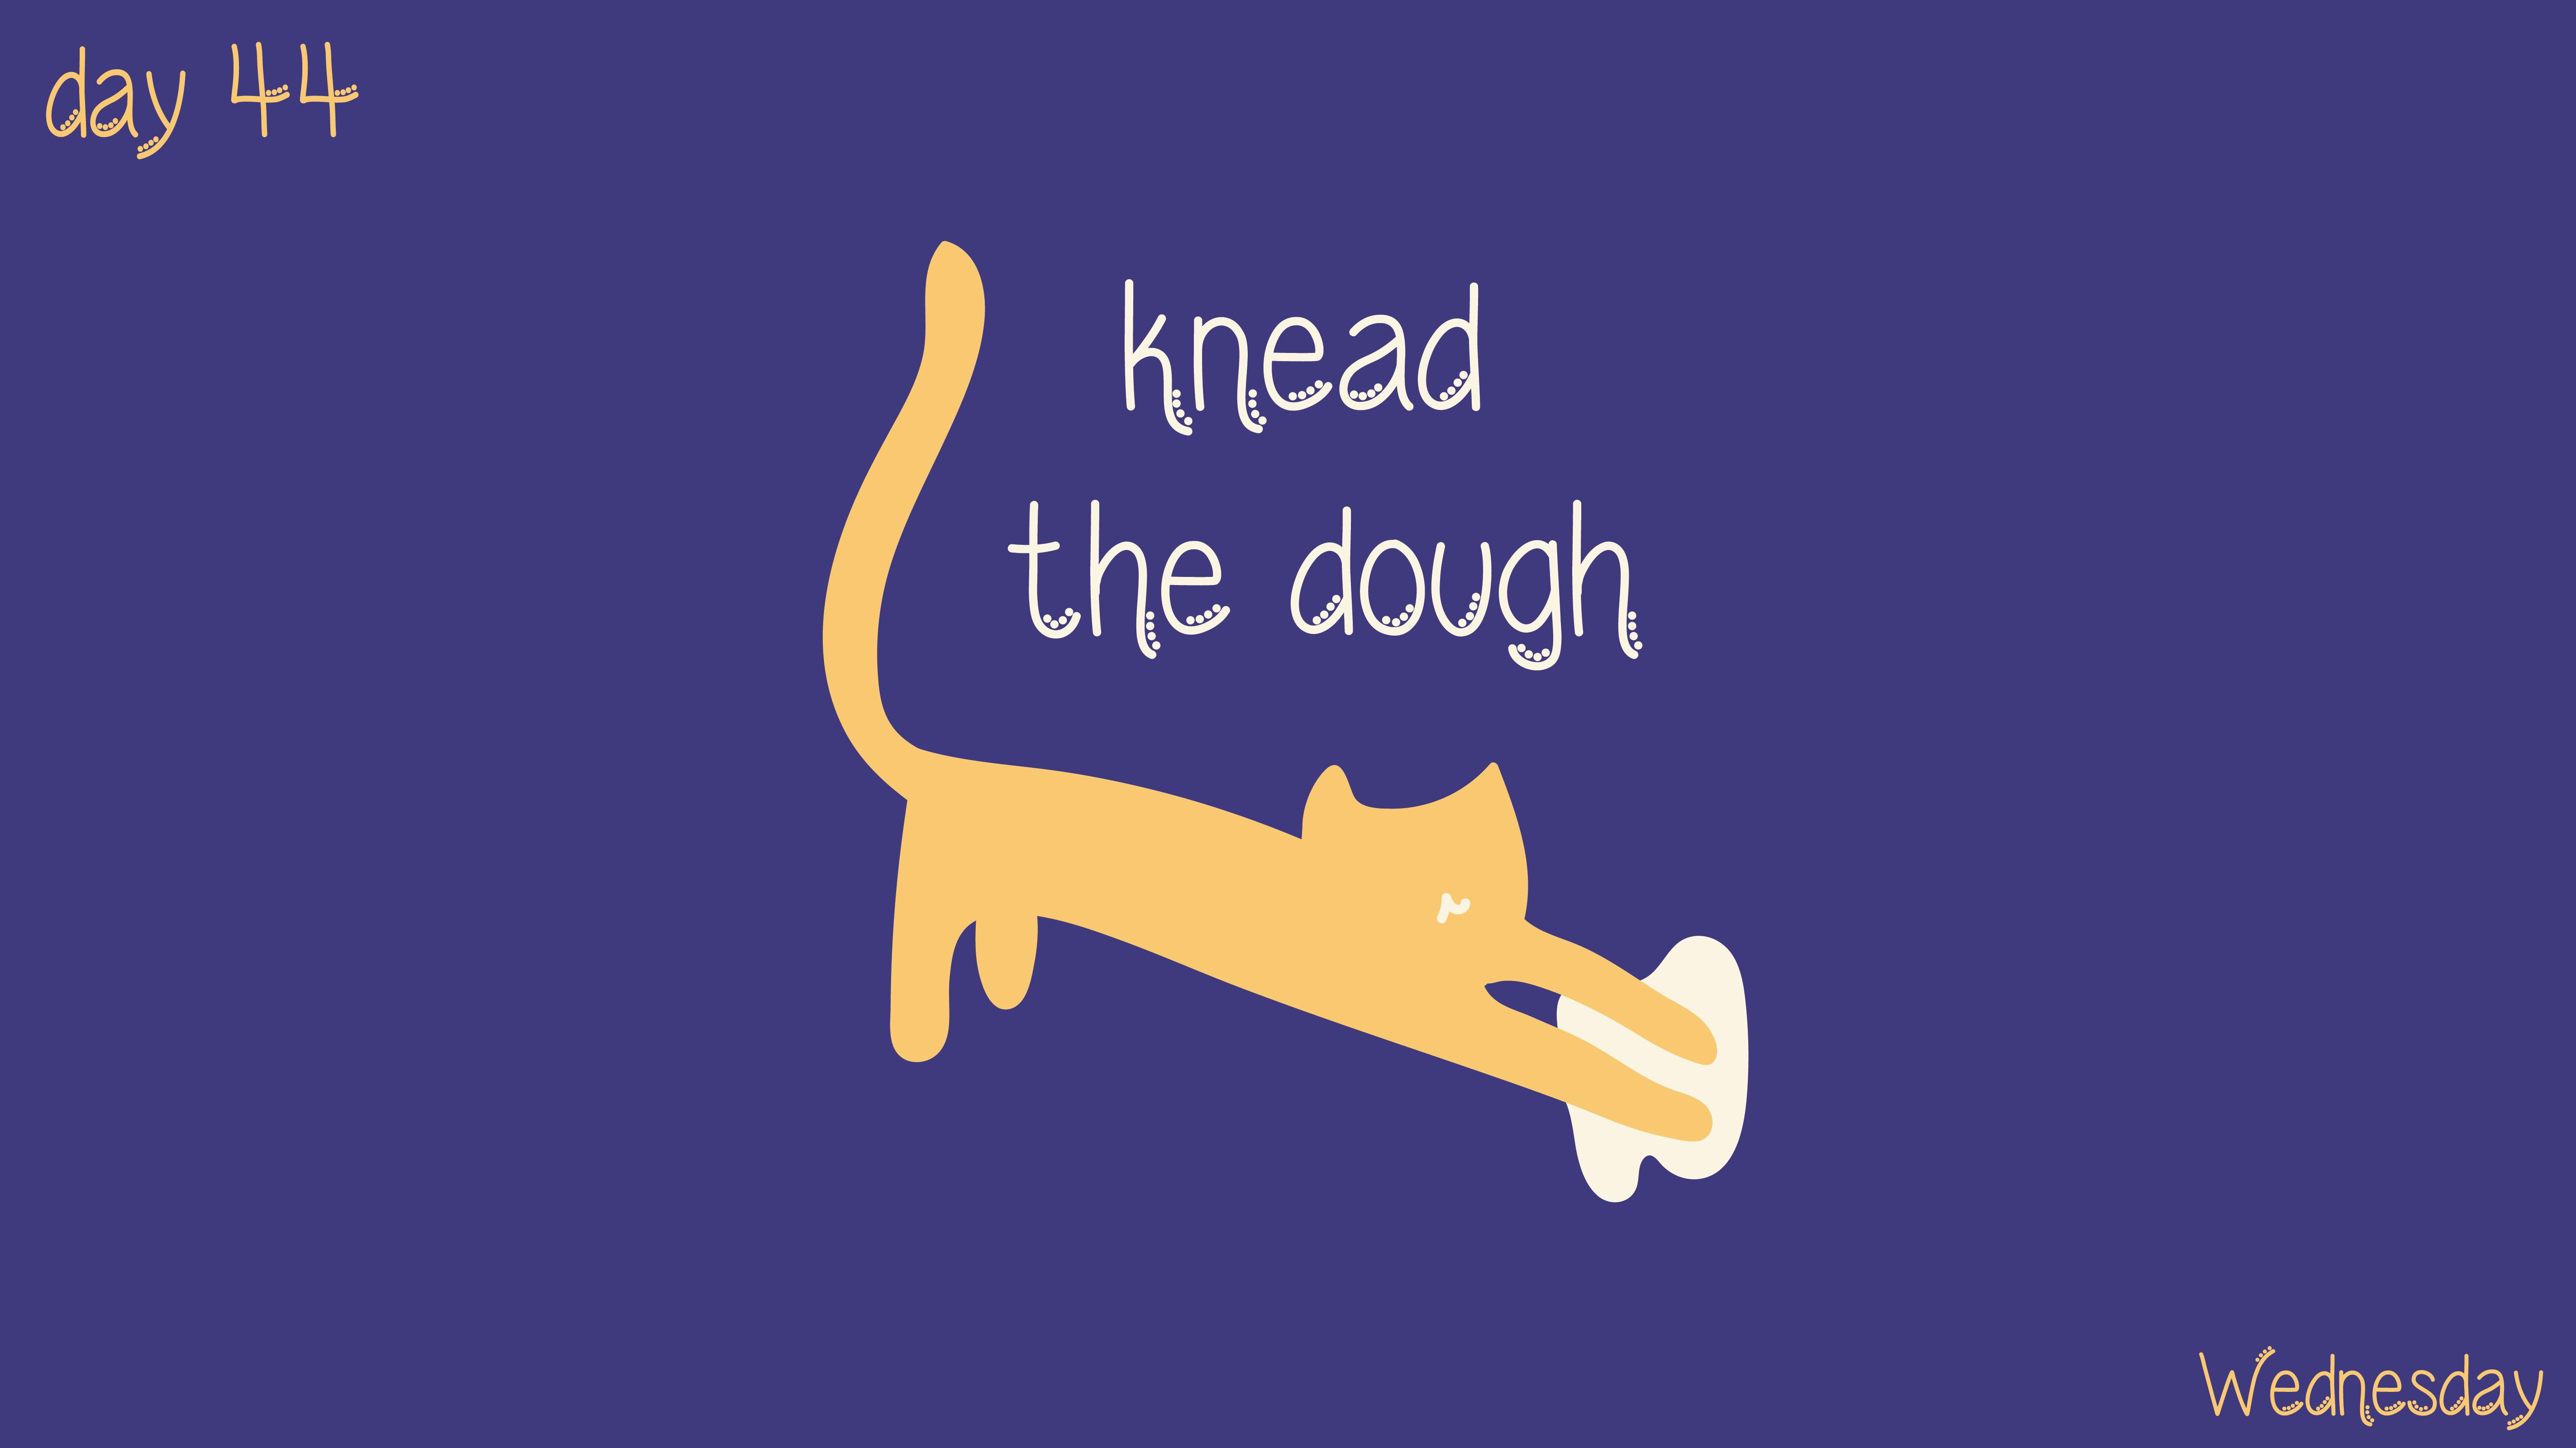 [cat]day4-04